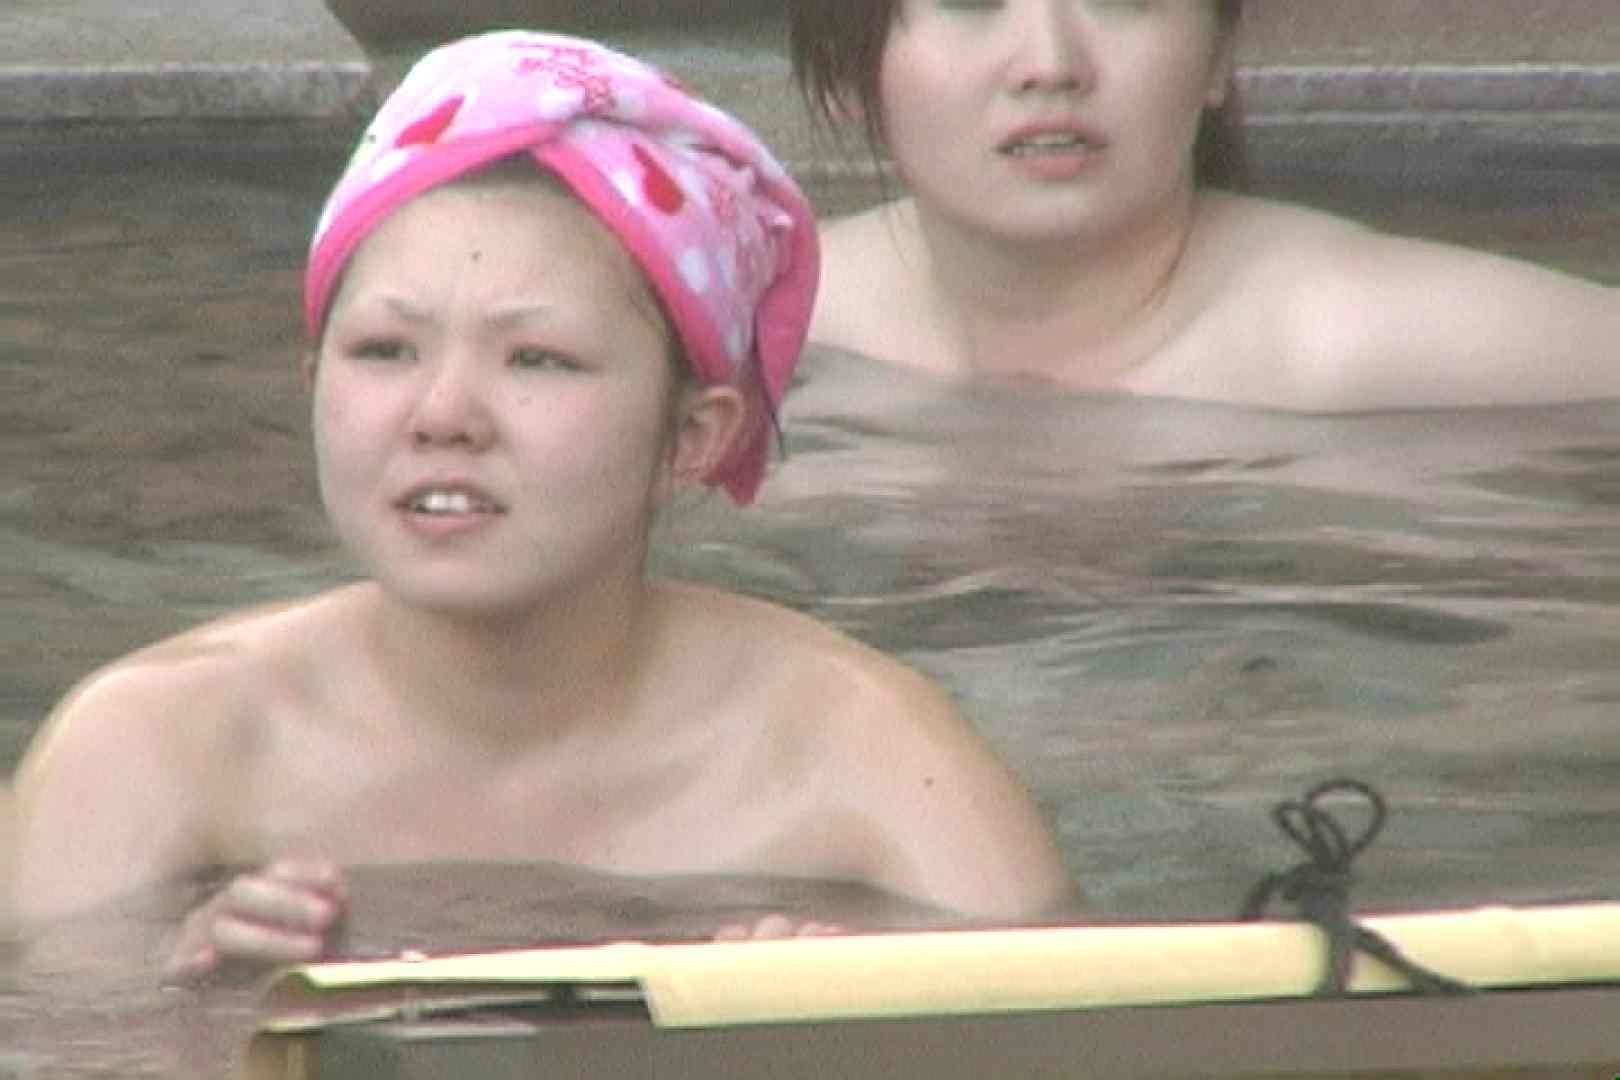 Aquaな露天風呂Vol.25 美しいOLの裸体 おまんこ無修正動画無料 72pic 17